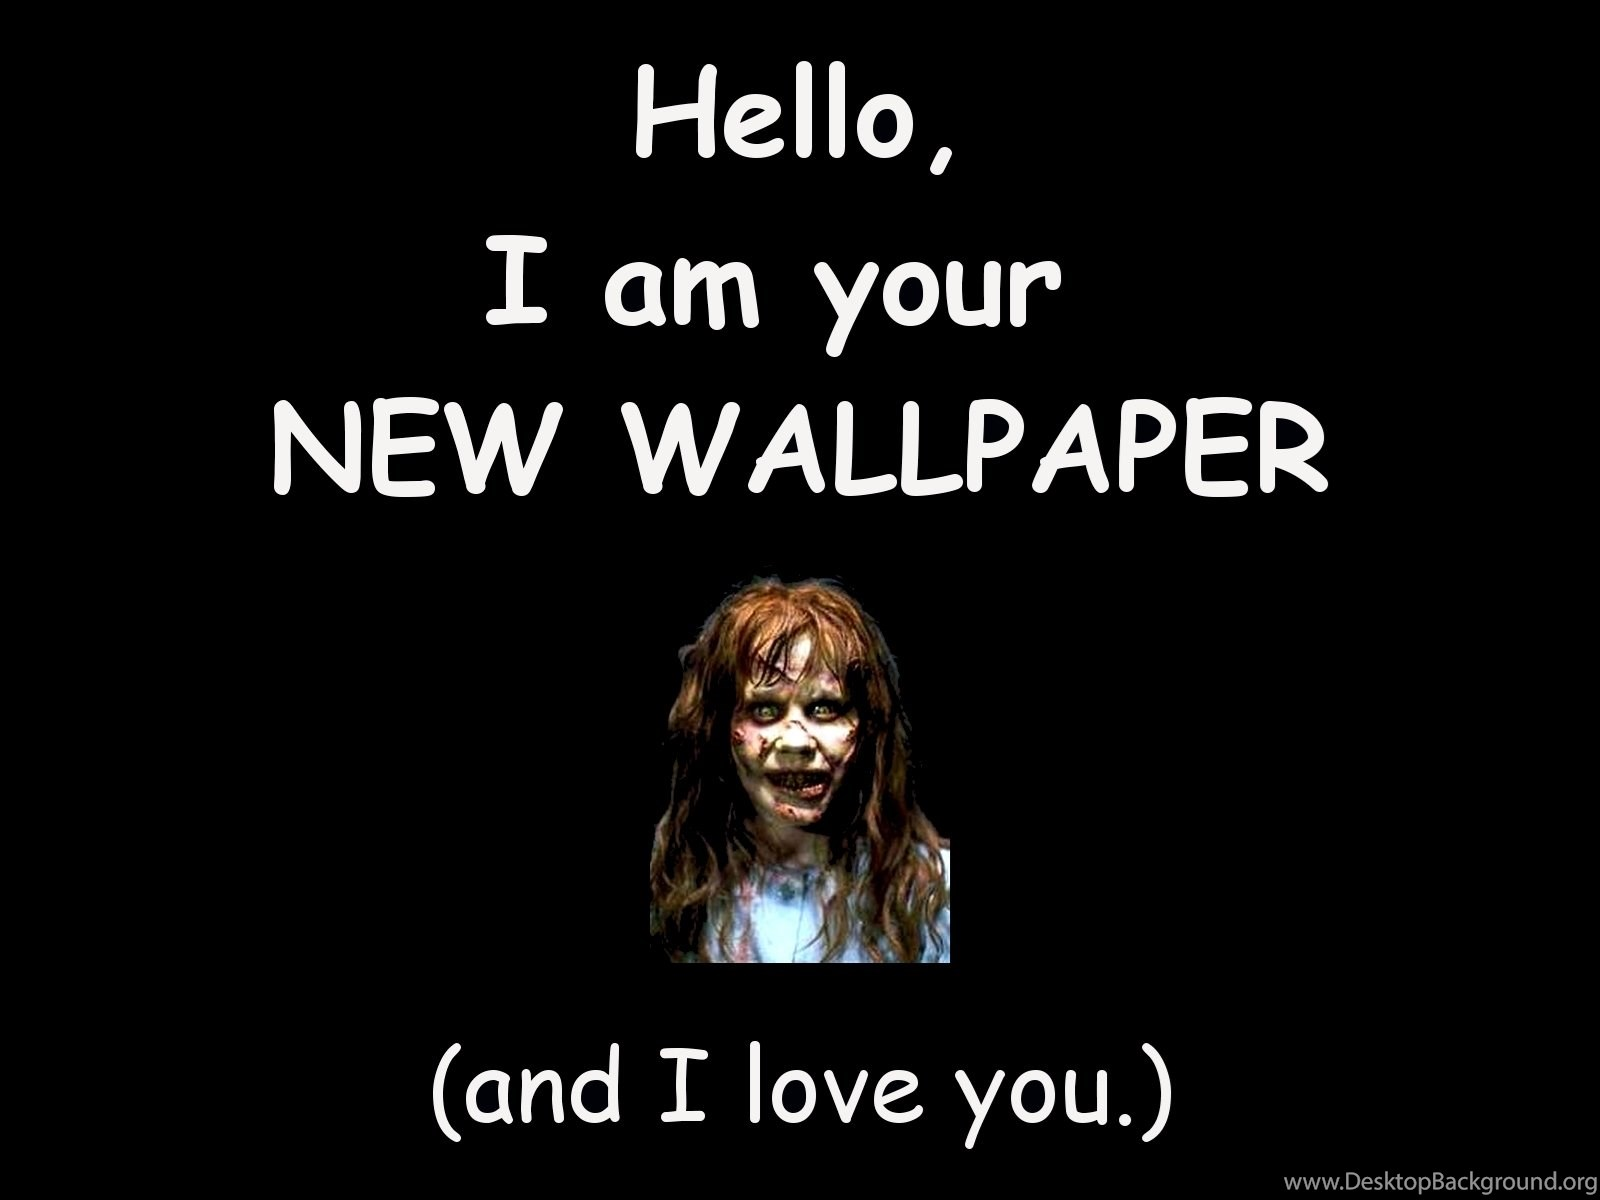 Humour Hd Wallpaper Hd Wallpaper Funny Hd Wallpapers Desktop Background